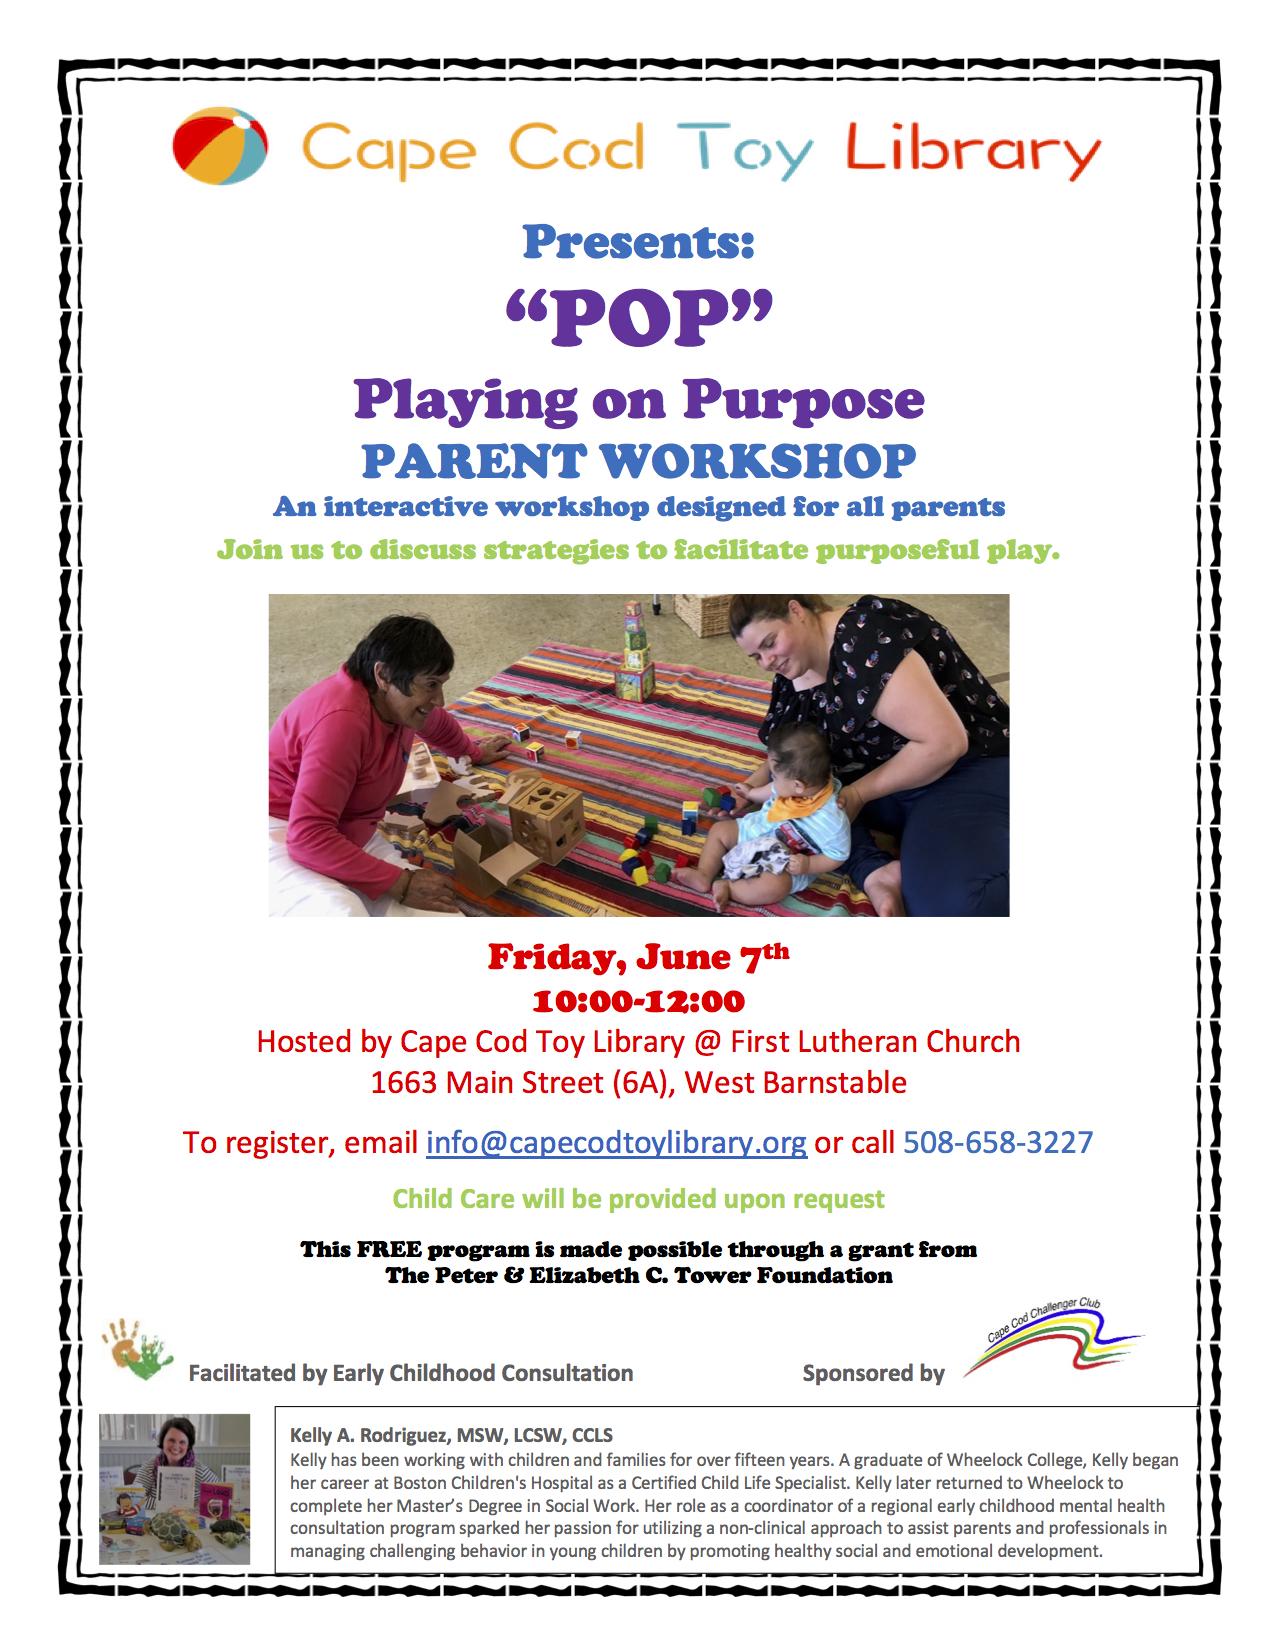 CCTL POP Parent Workshop Flyer.jpg